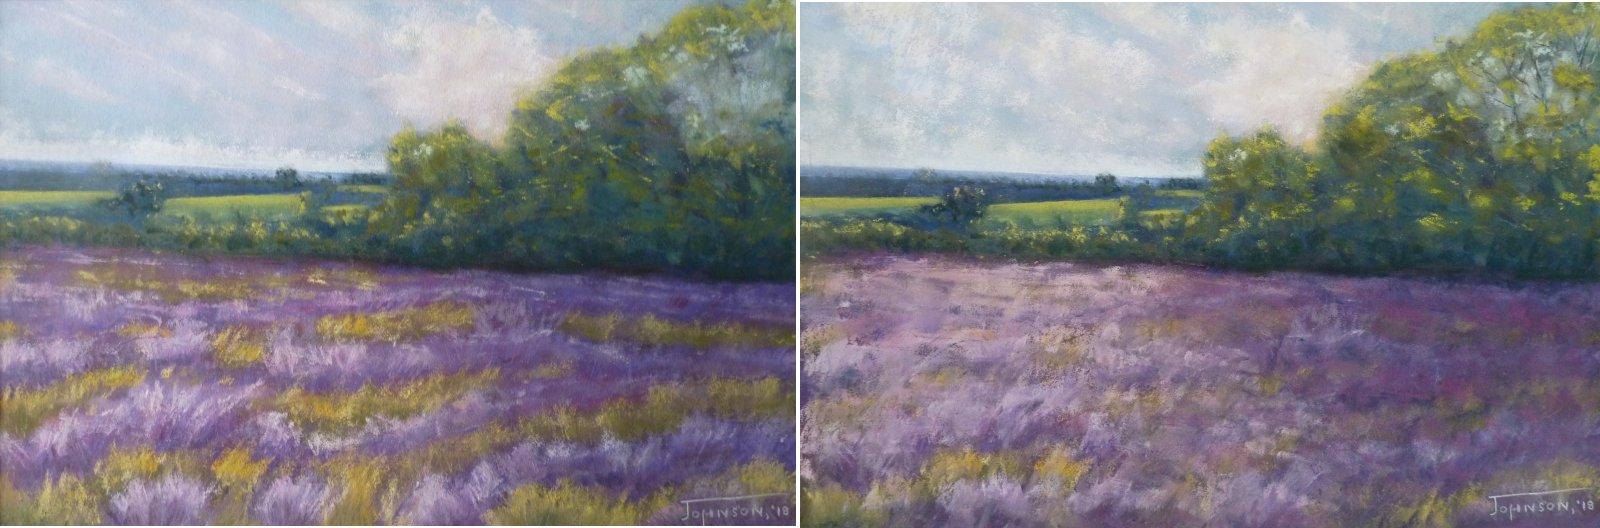 Lavender Field Improvements